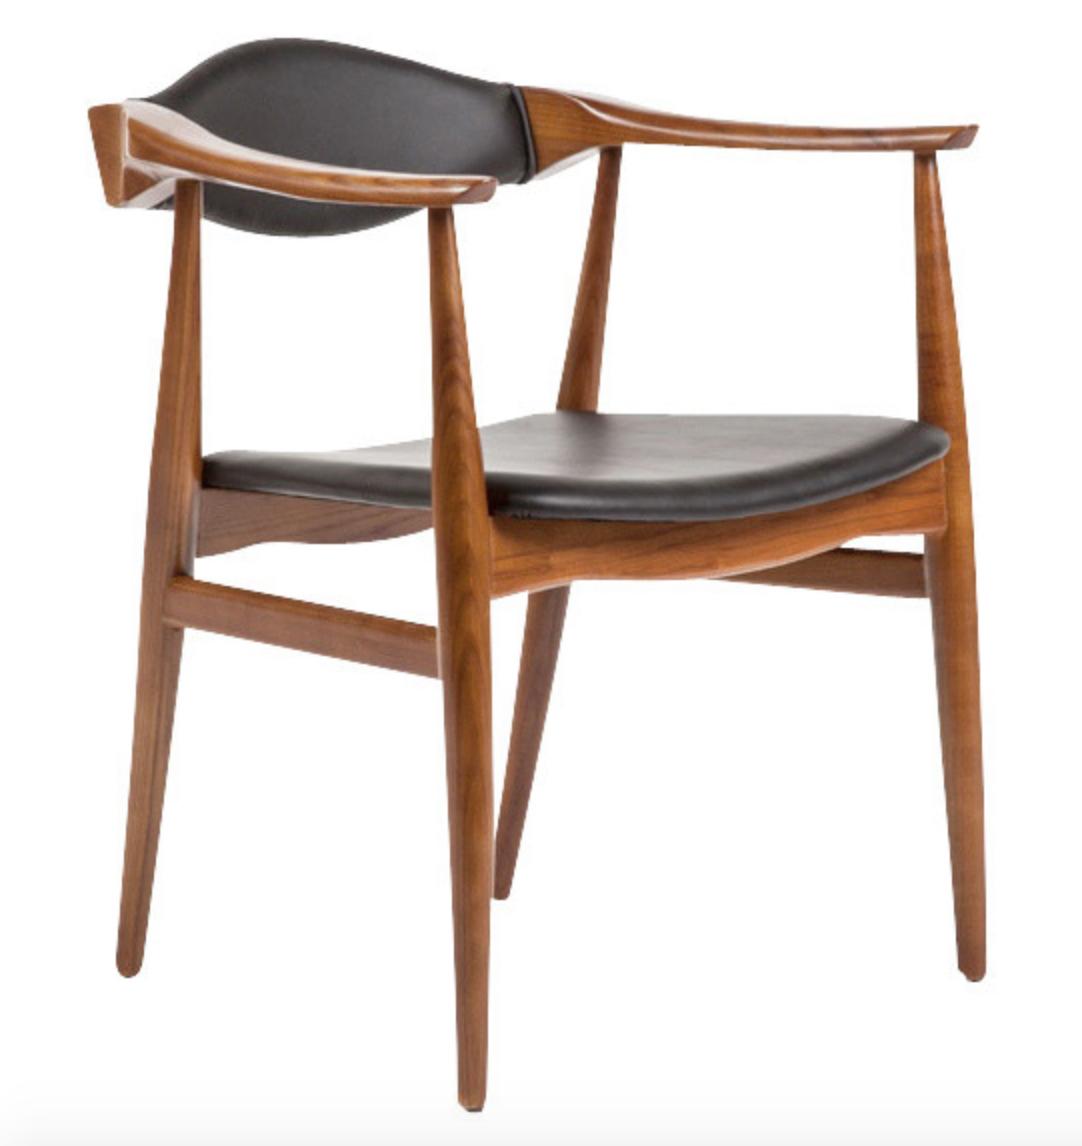 danish-chair-walnut.jpg